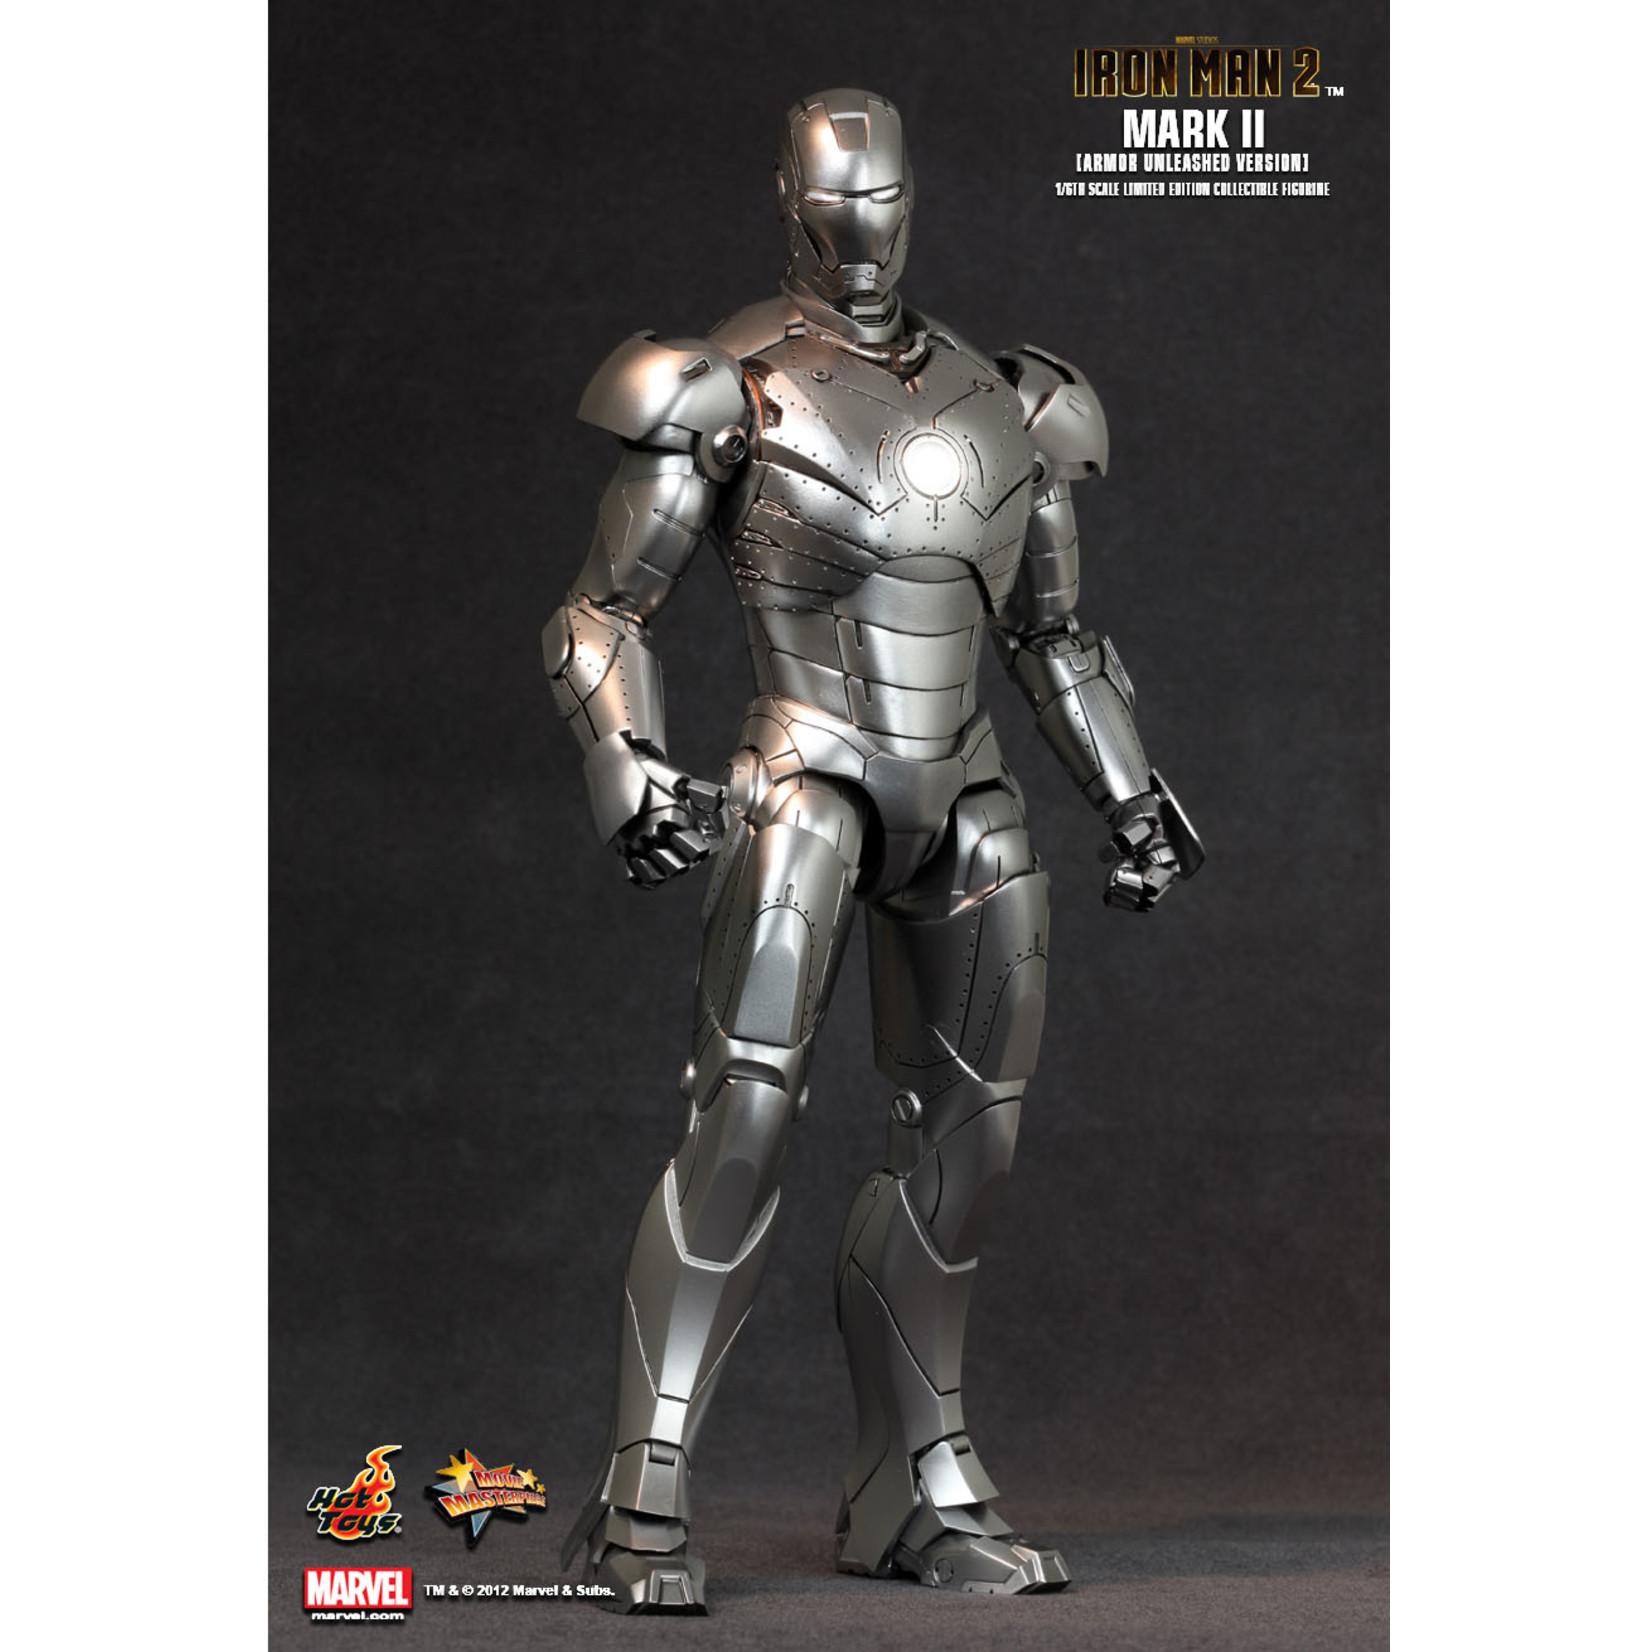 Hot Toys Iron man Mark II Armor Unleashed Version MMS150